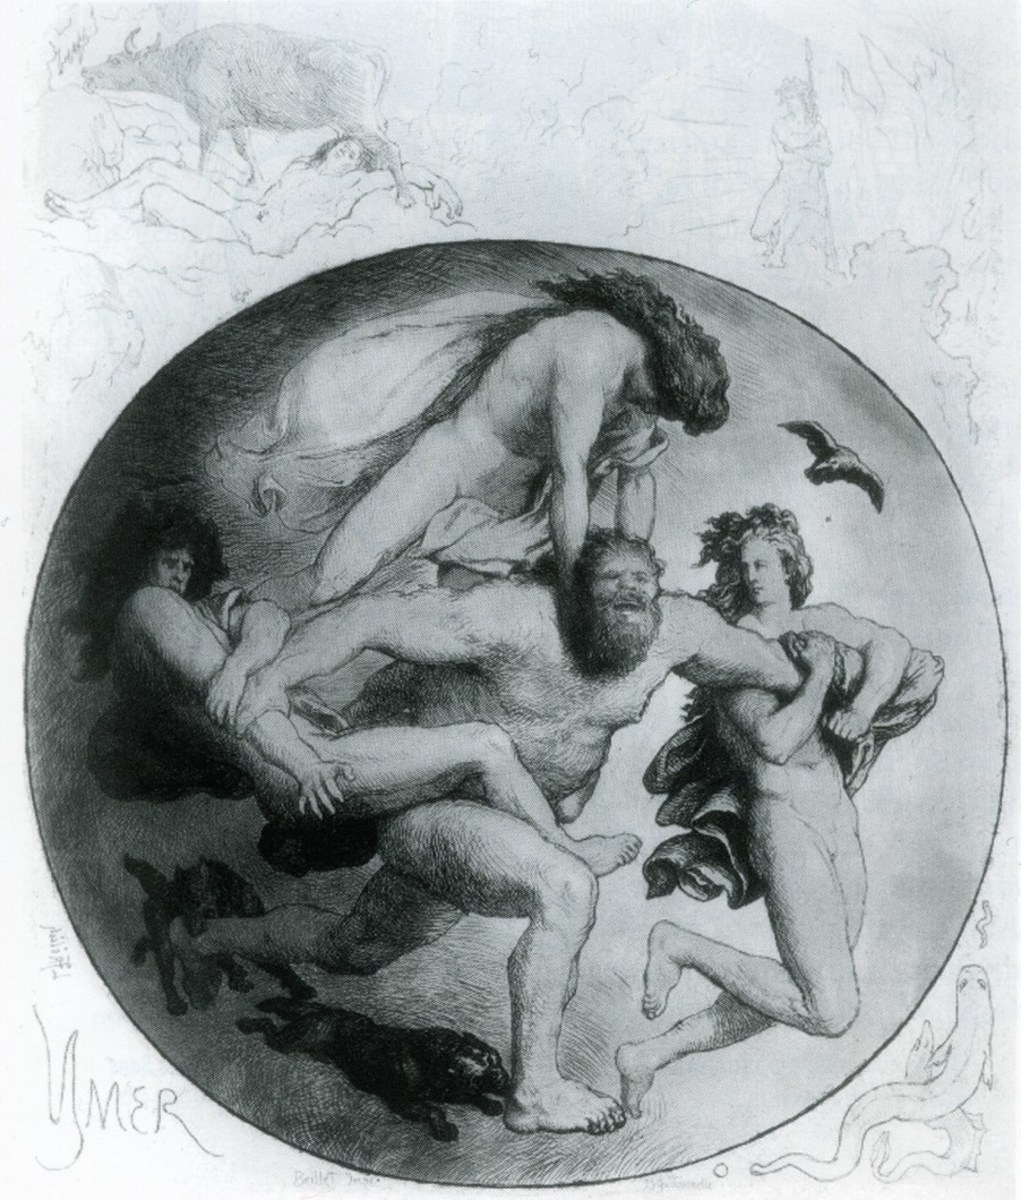 death of Ymir by Odin by Lorenz Frølich